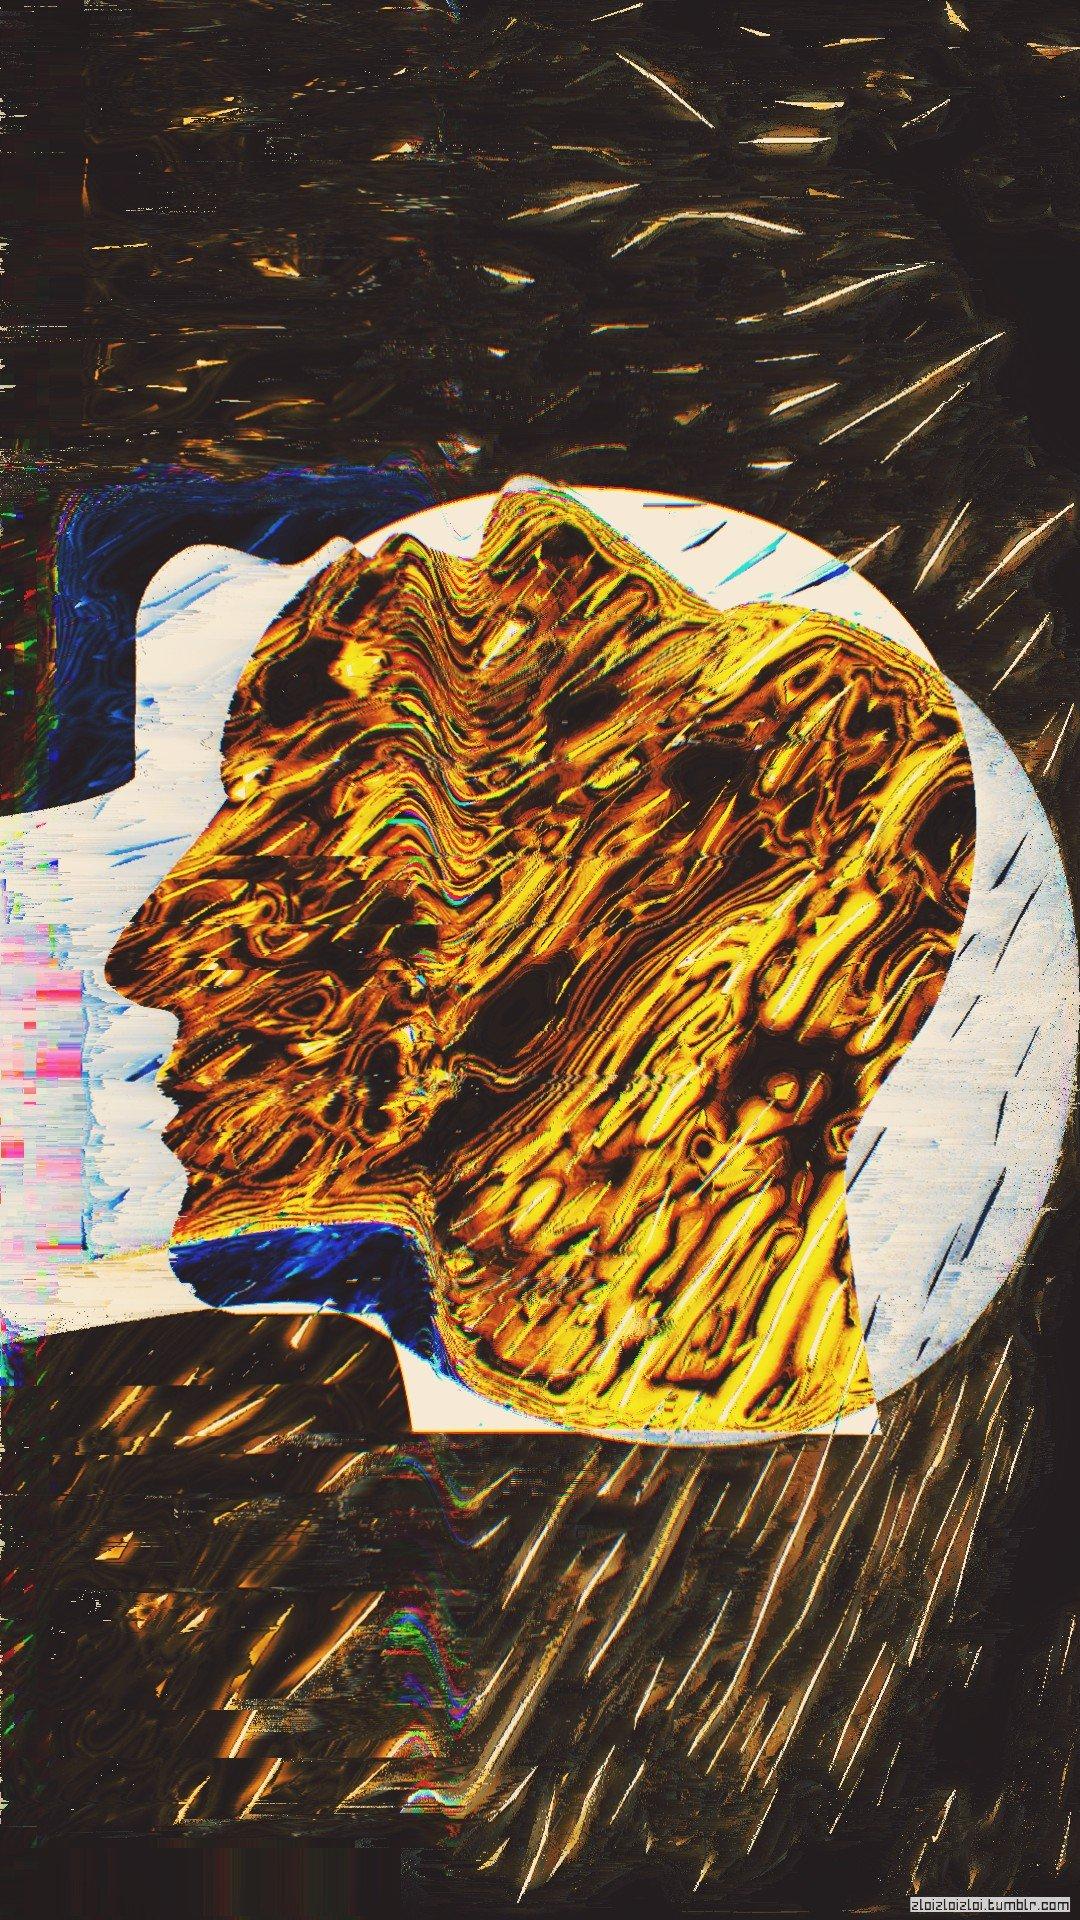 Face, Glitch Art, Gold, Abstract HD Wallpapers / Desktop